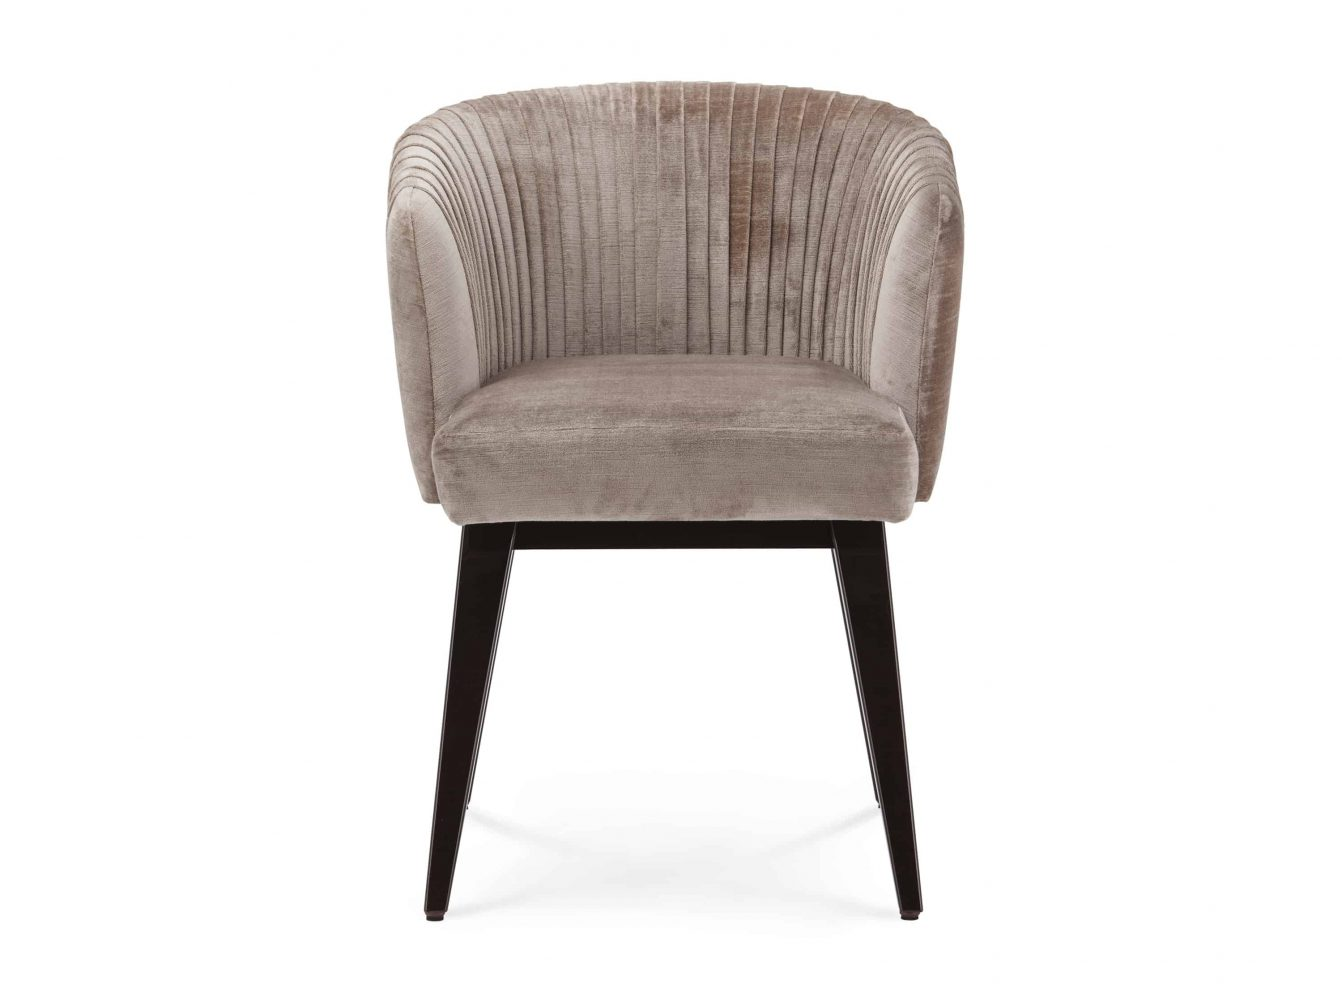 Eleanor-G701918-Chair-S-01